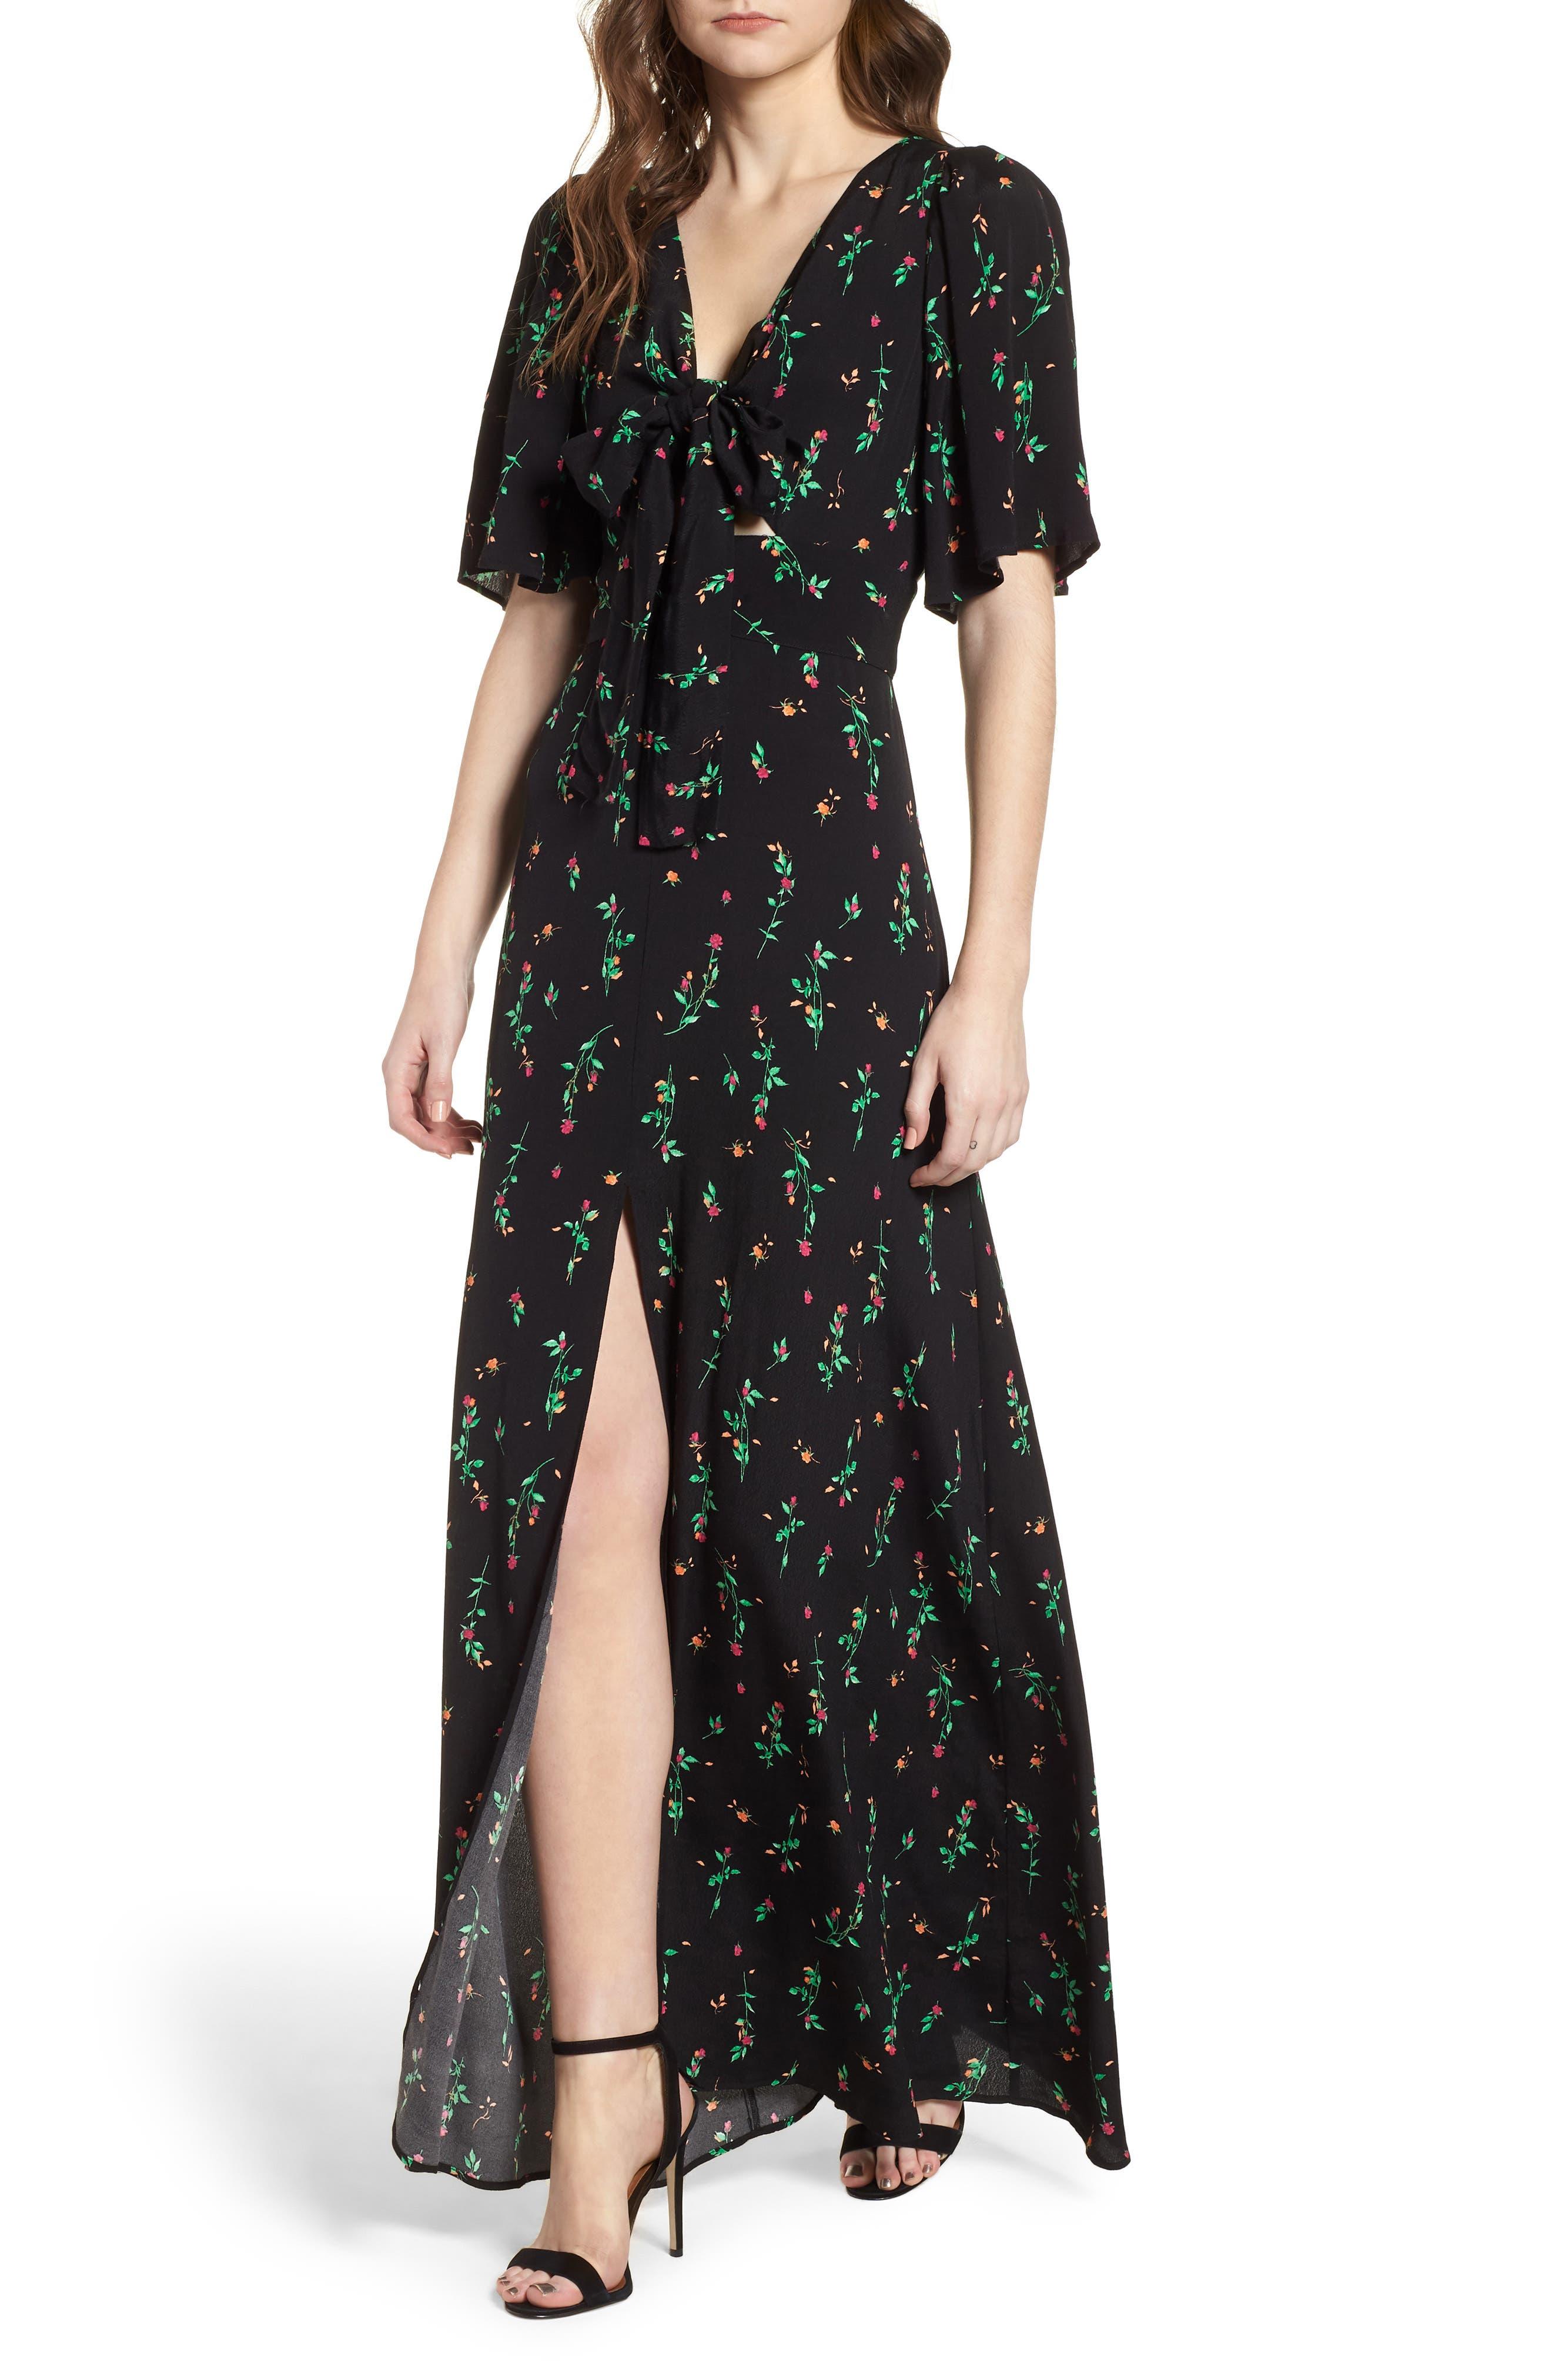 Ramon Tie Front Maxi Dress,                             Main thumbnail 1, color,                             Noir Rose Ditsy